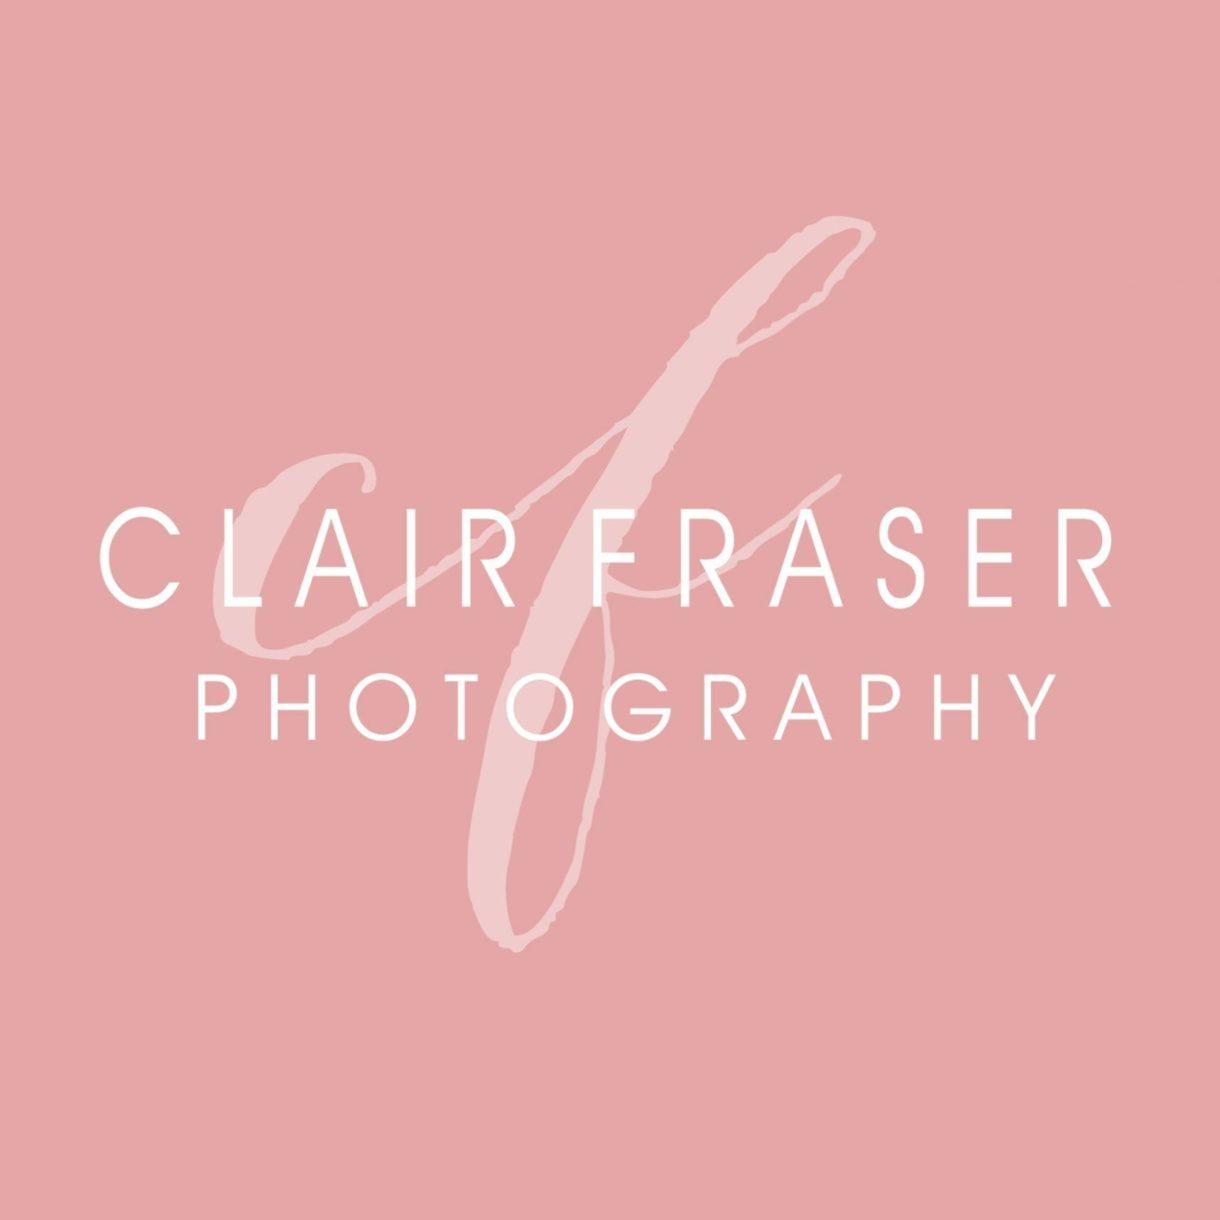 Fraser Photography